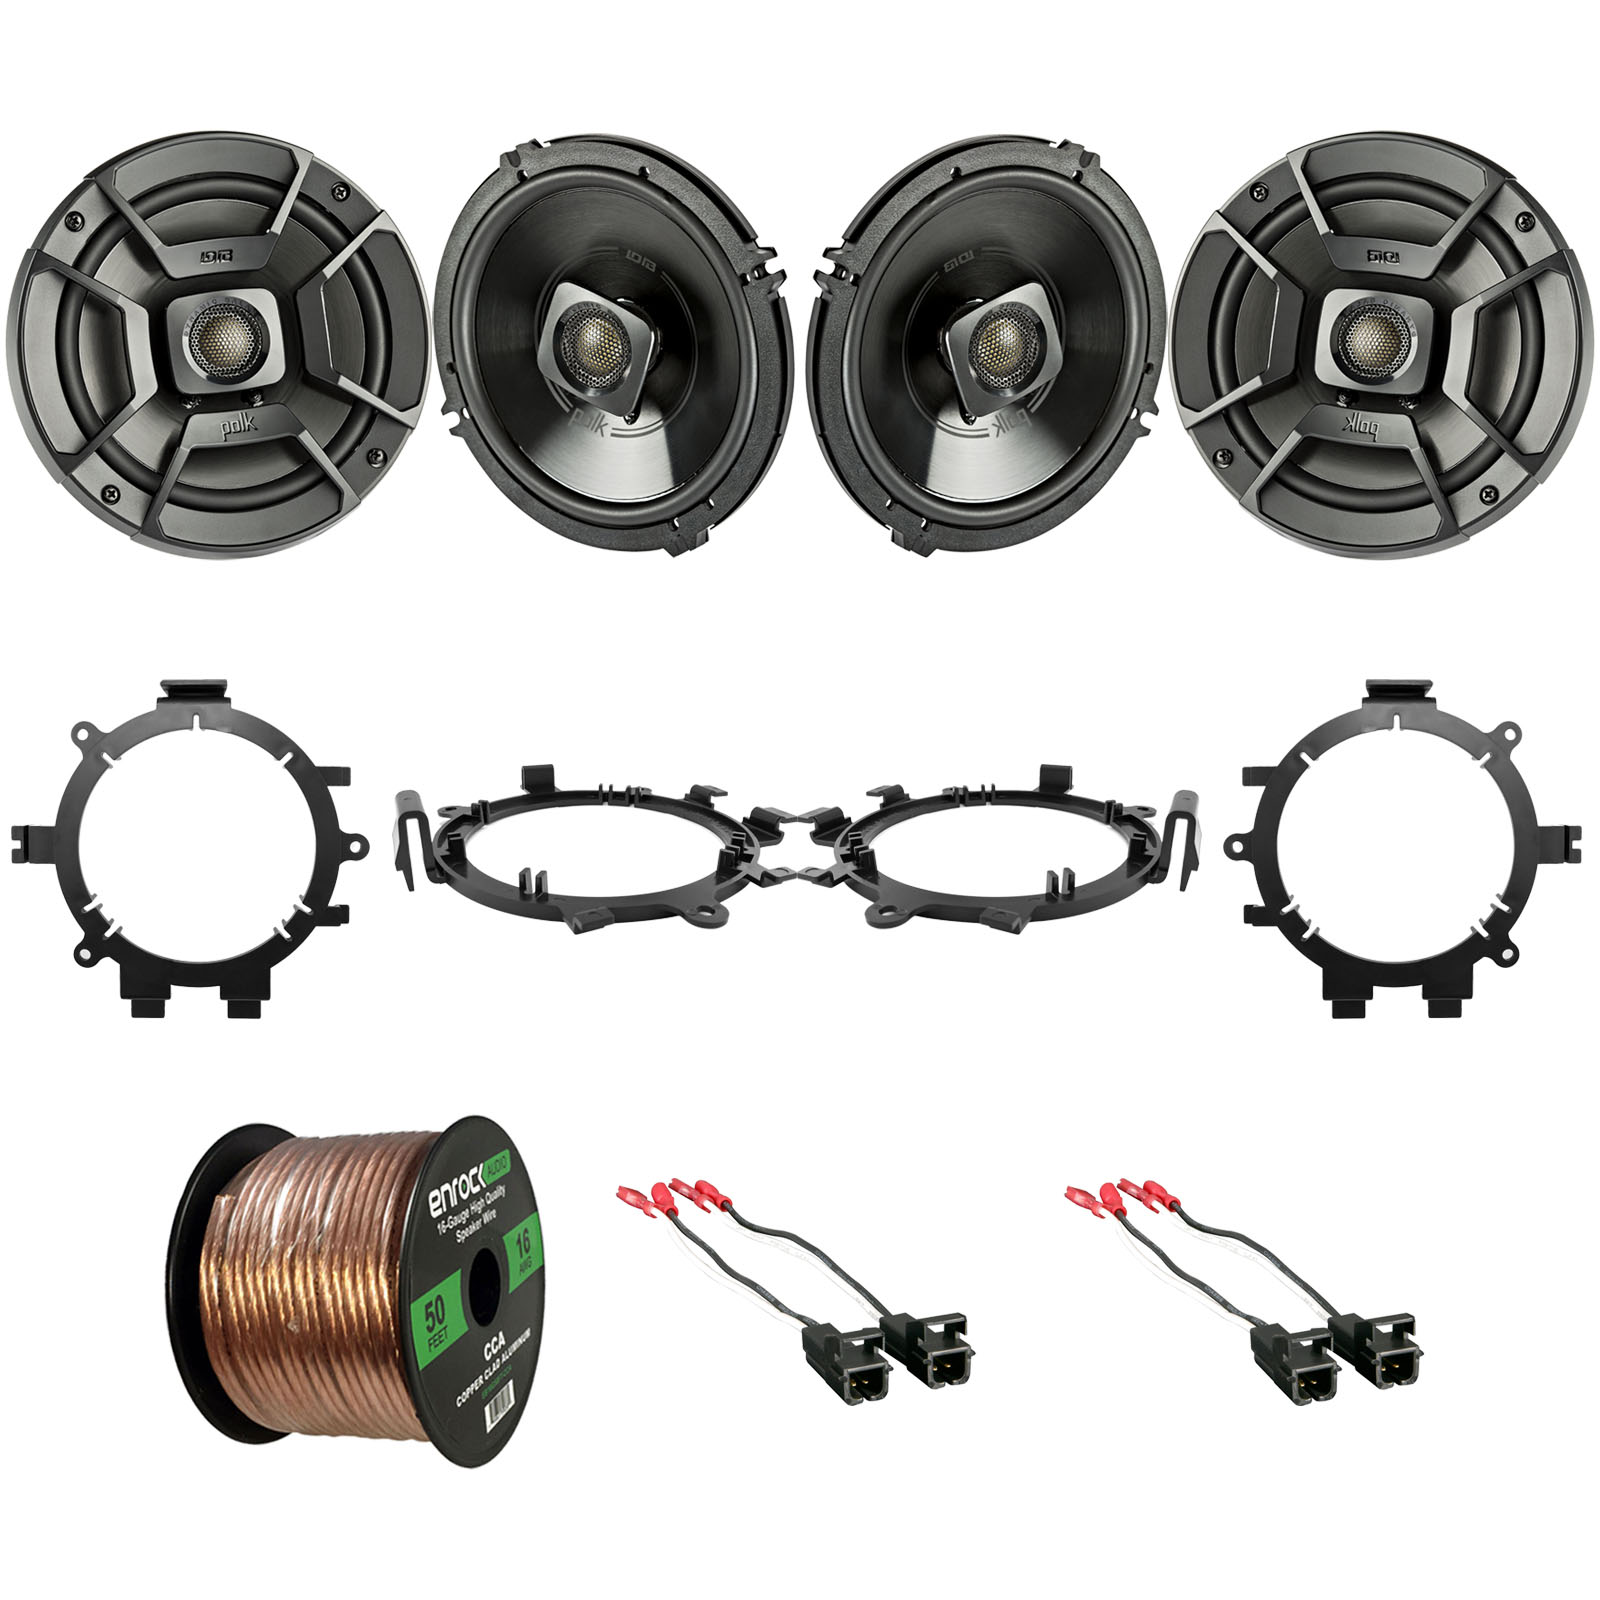 "4x Polk DB652 6.5"" 300W 2 Way Car/Marine ATV Speakers, 4x Metra Speaker Wire Harness, 4x Speaker Mounting Brackets Adaptors, 16-Gauge 50 Foot Wire (Select 1995-2009 Vehicles)"